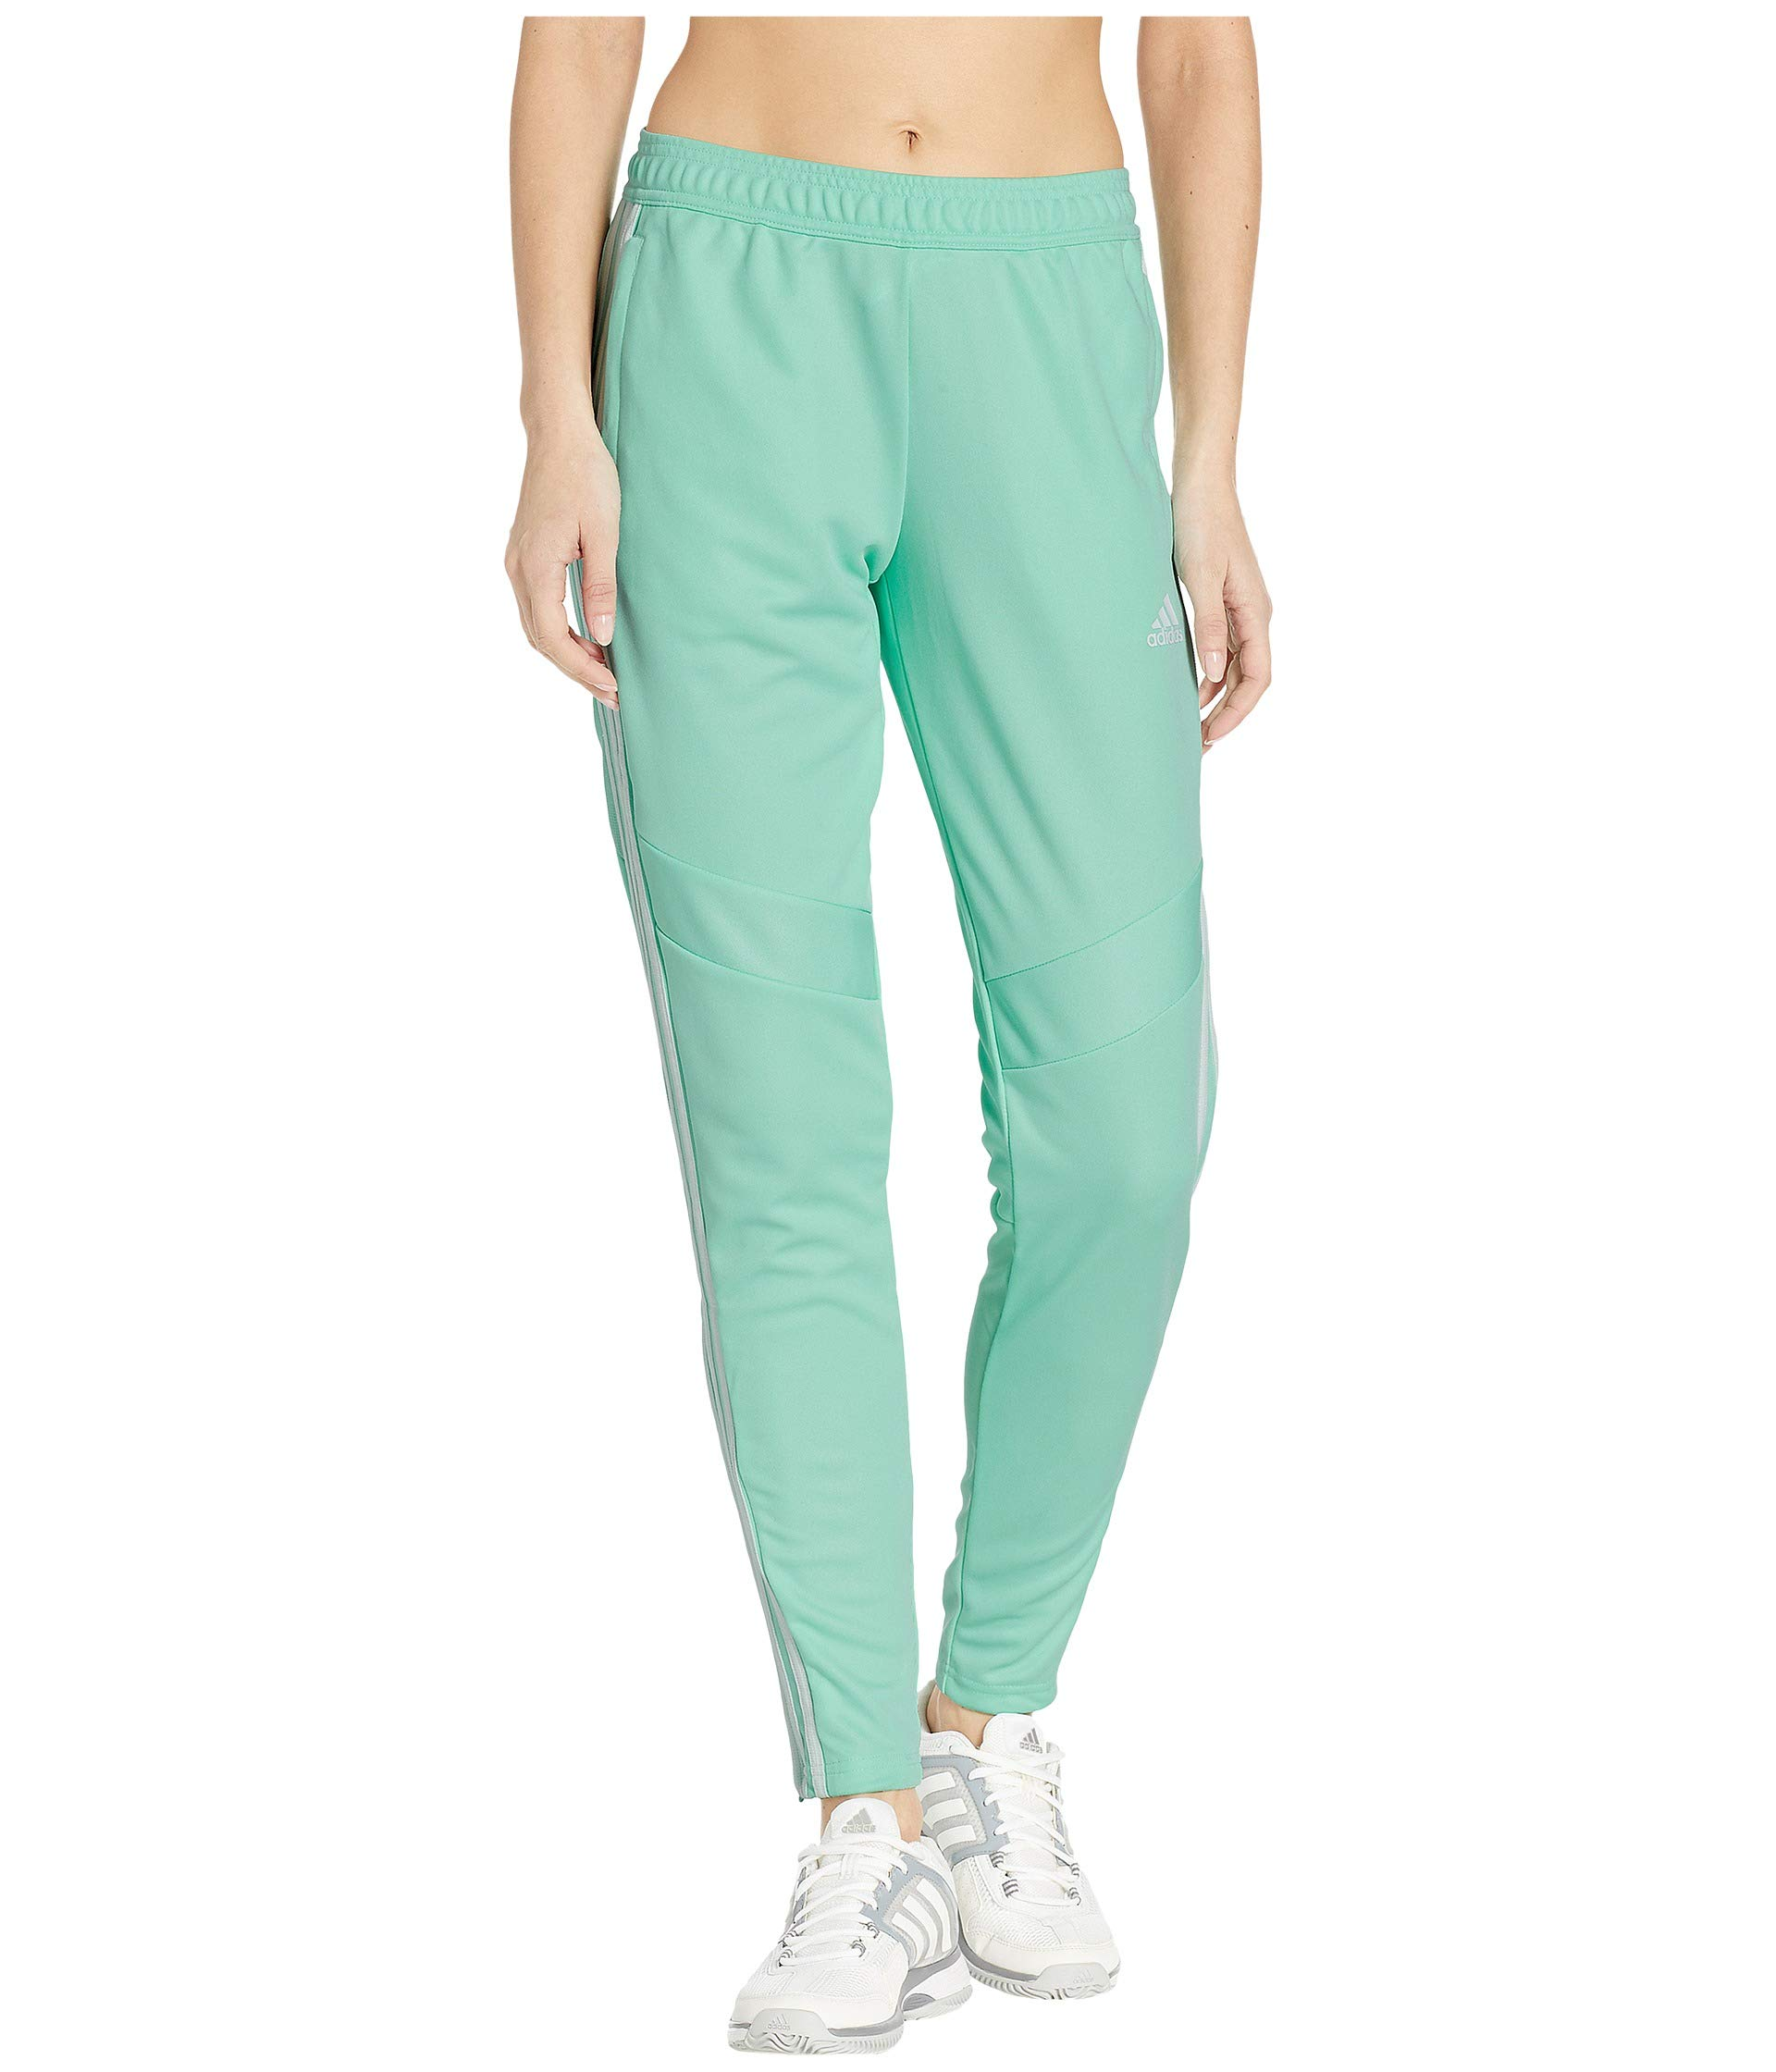 adidas Women's Tiro '19 Pants Clear Mint/White Small 30 by adidas (Image #1)